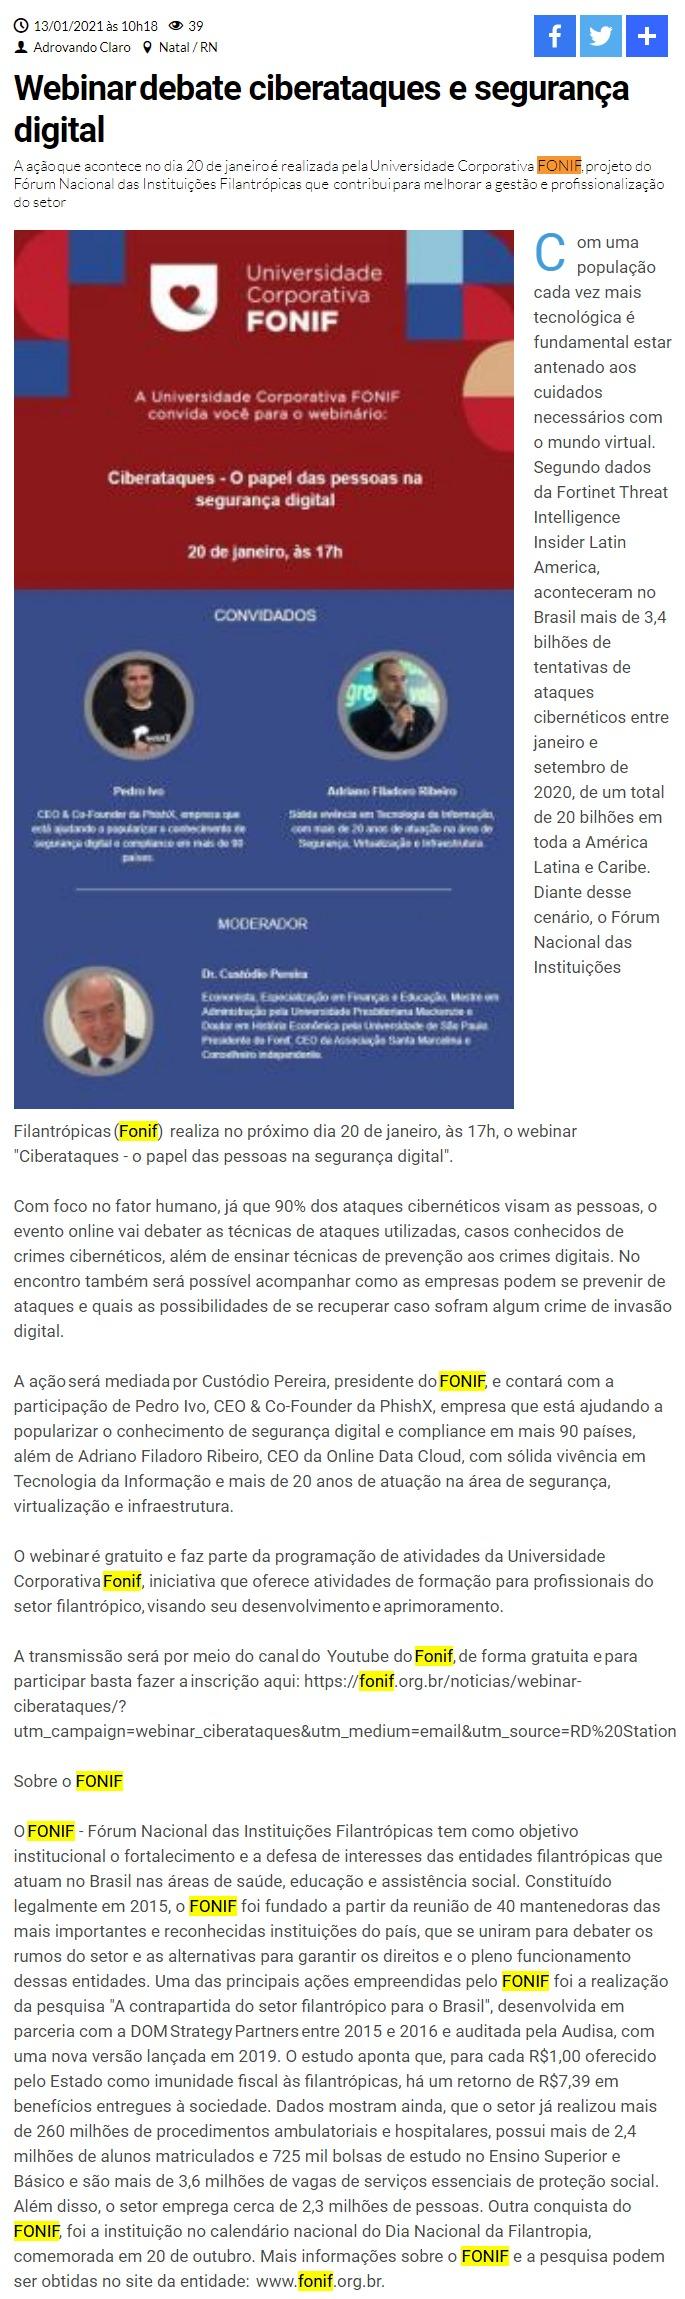 Webinardebate ciberataques e segurança digital - Gazeta de Natal